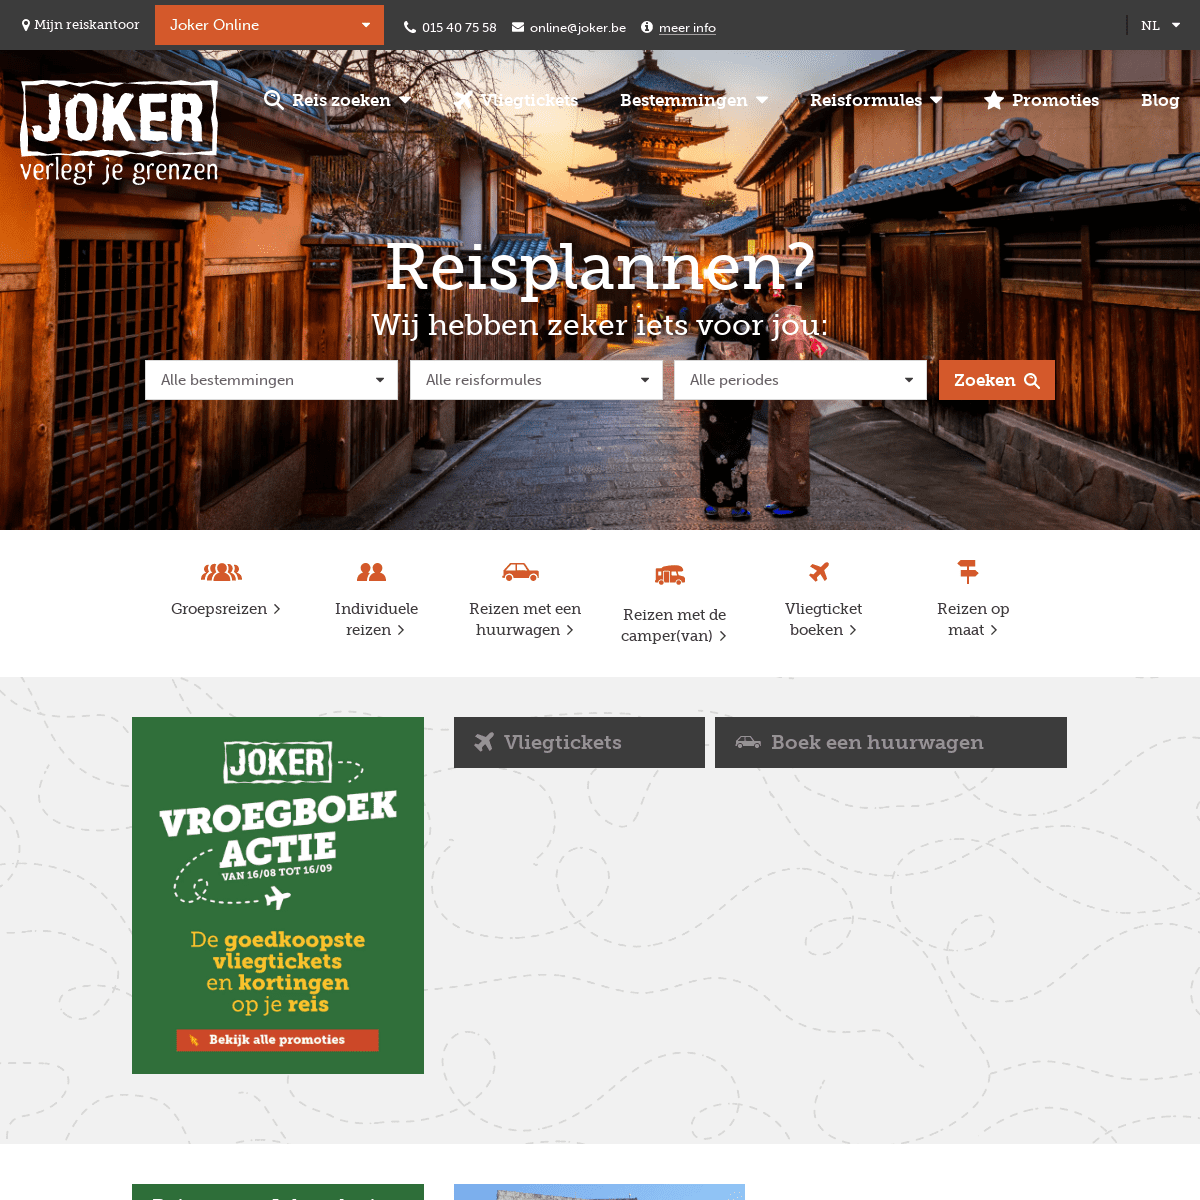 Archivebaycom Citation For Jokerbe Goedkope